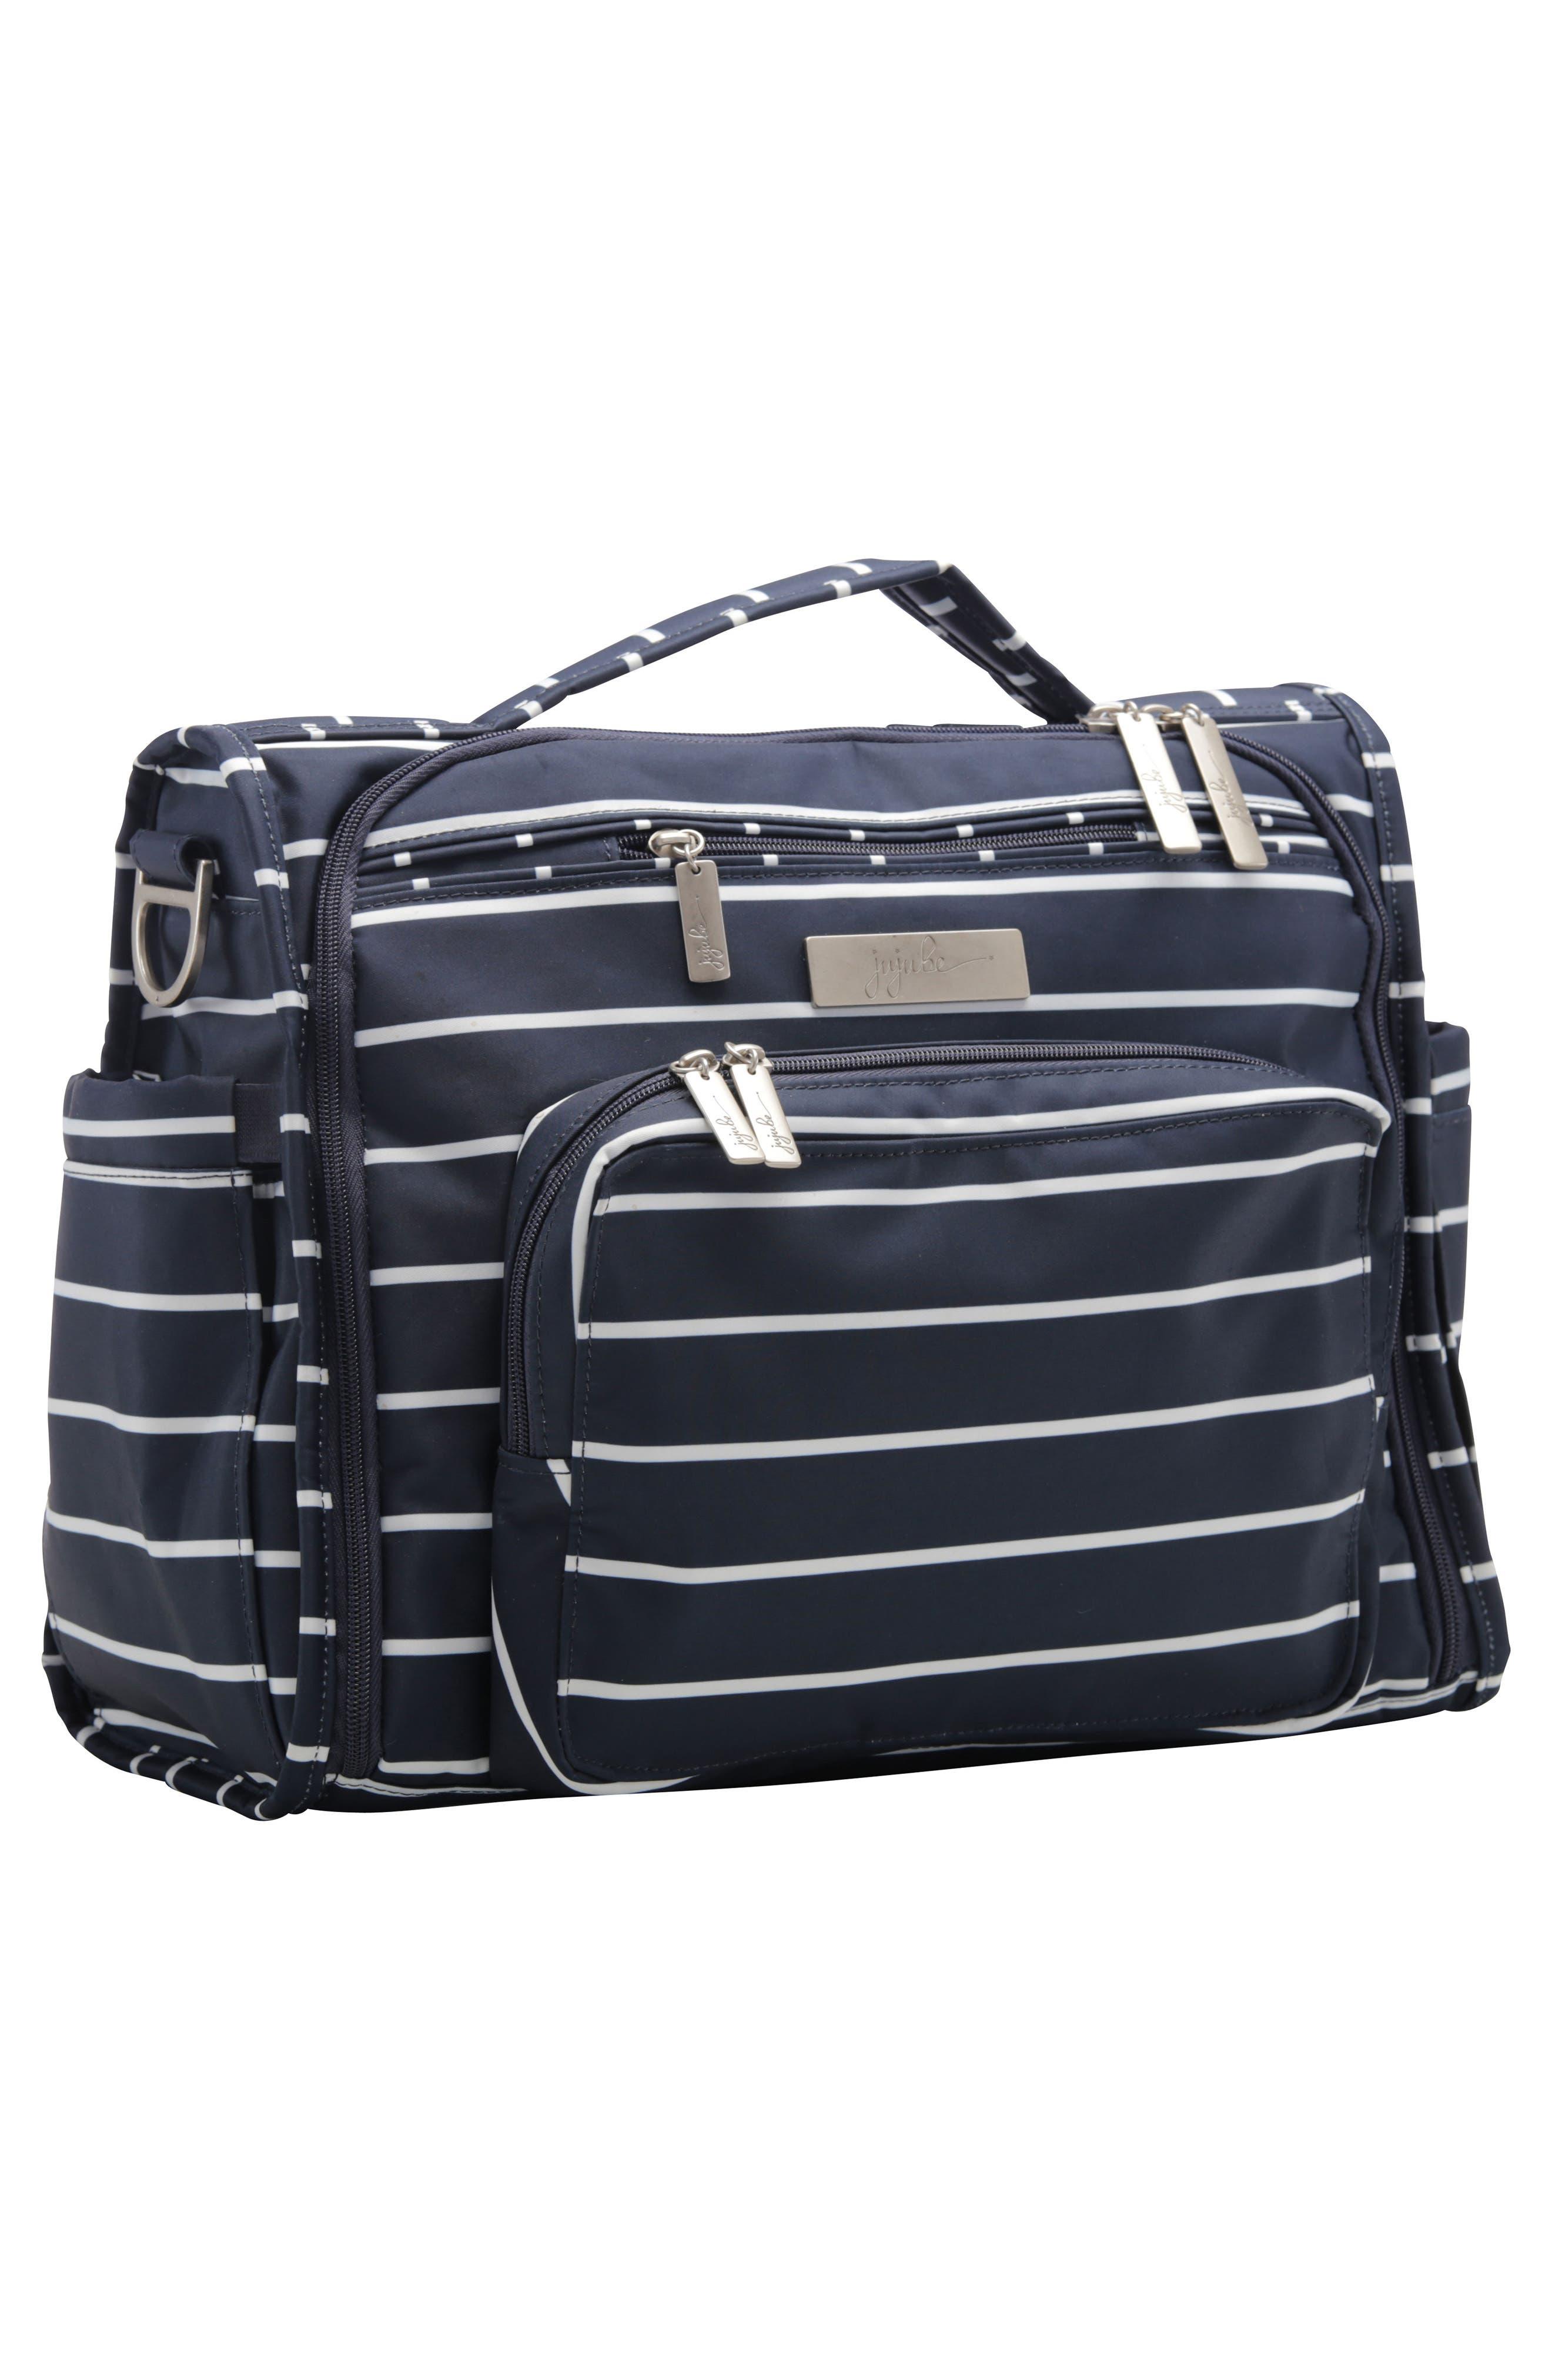 BFF - Coastal Collection Diaper Bag,                             Alternate thumbnail 8, color,